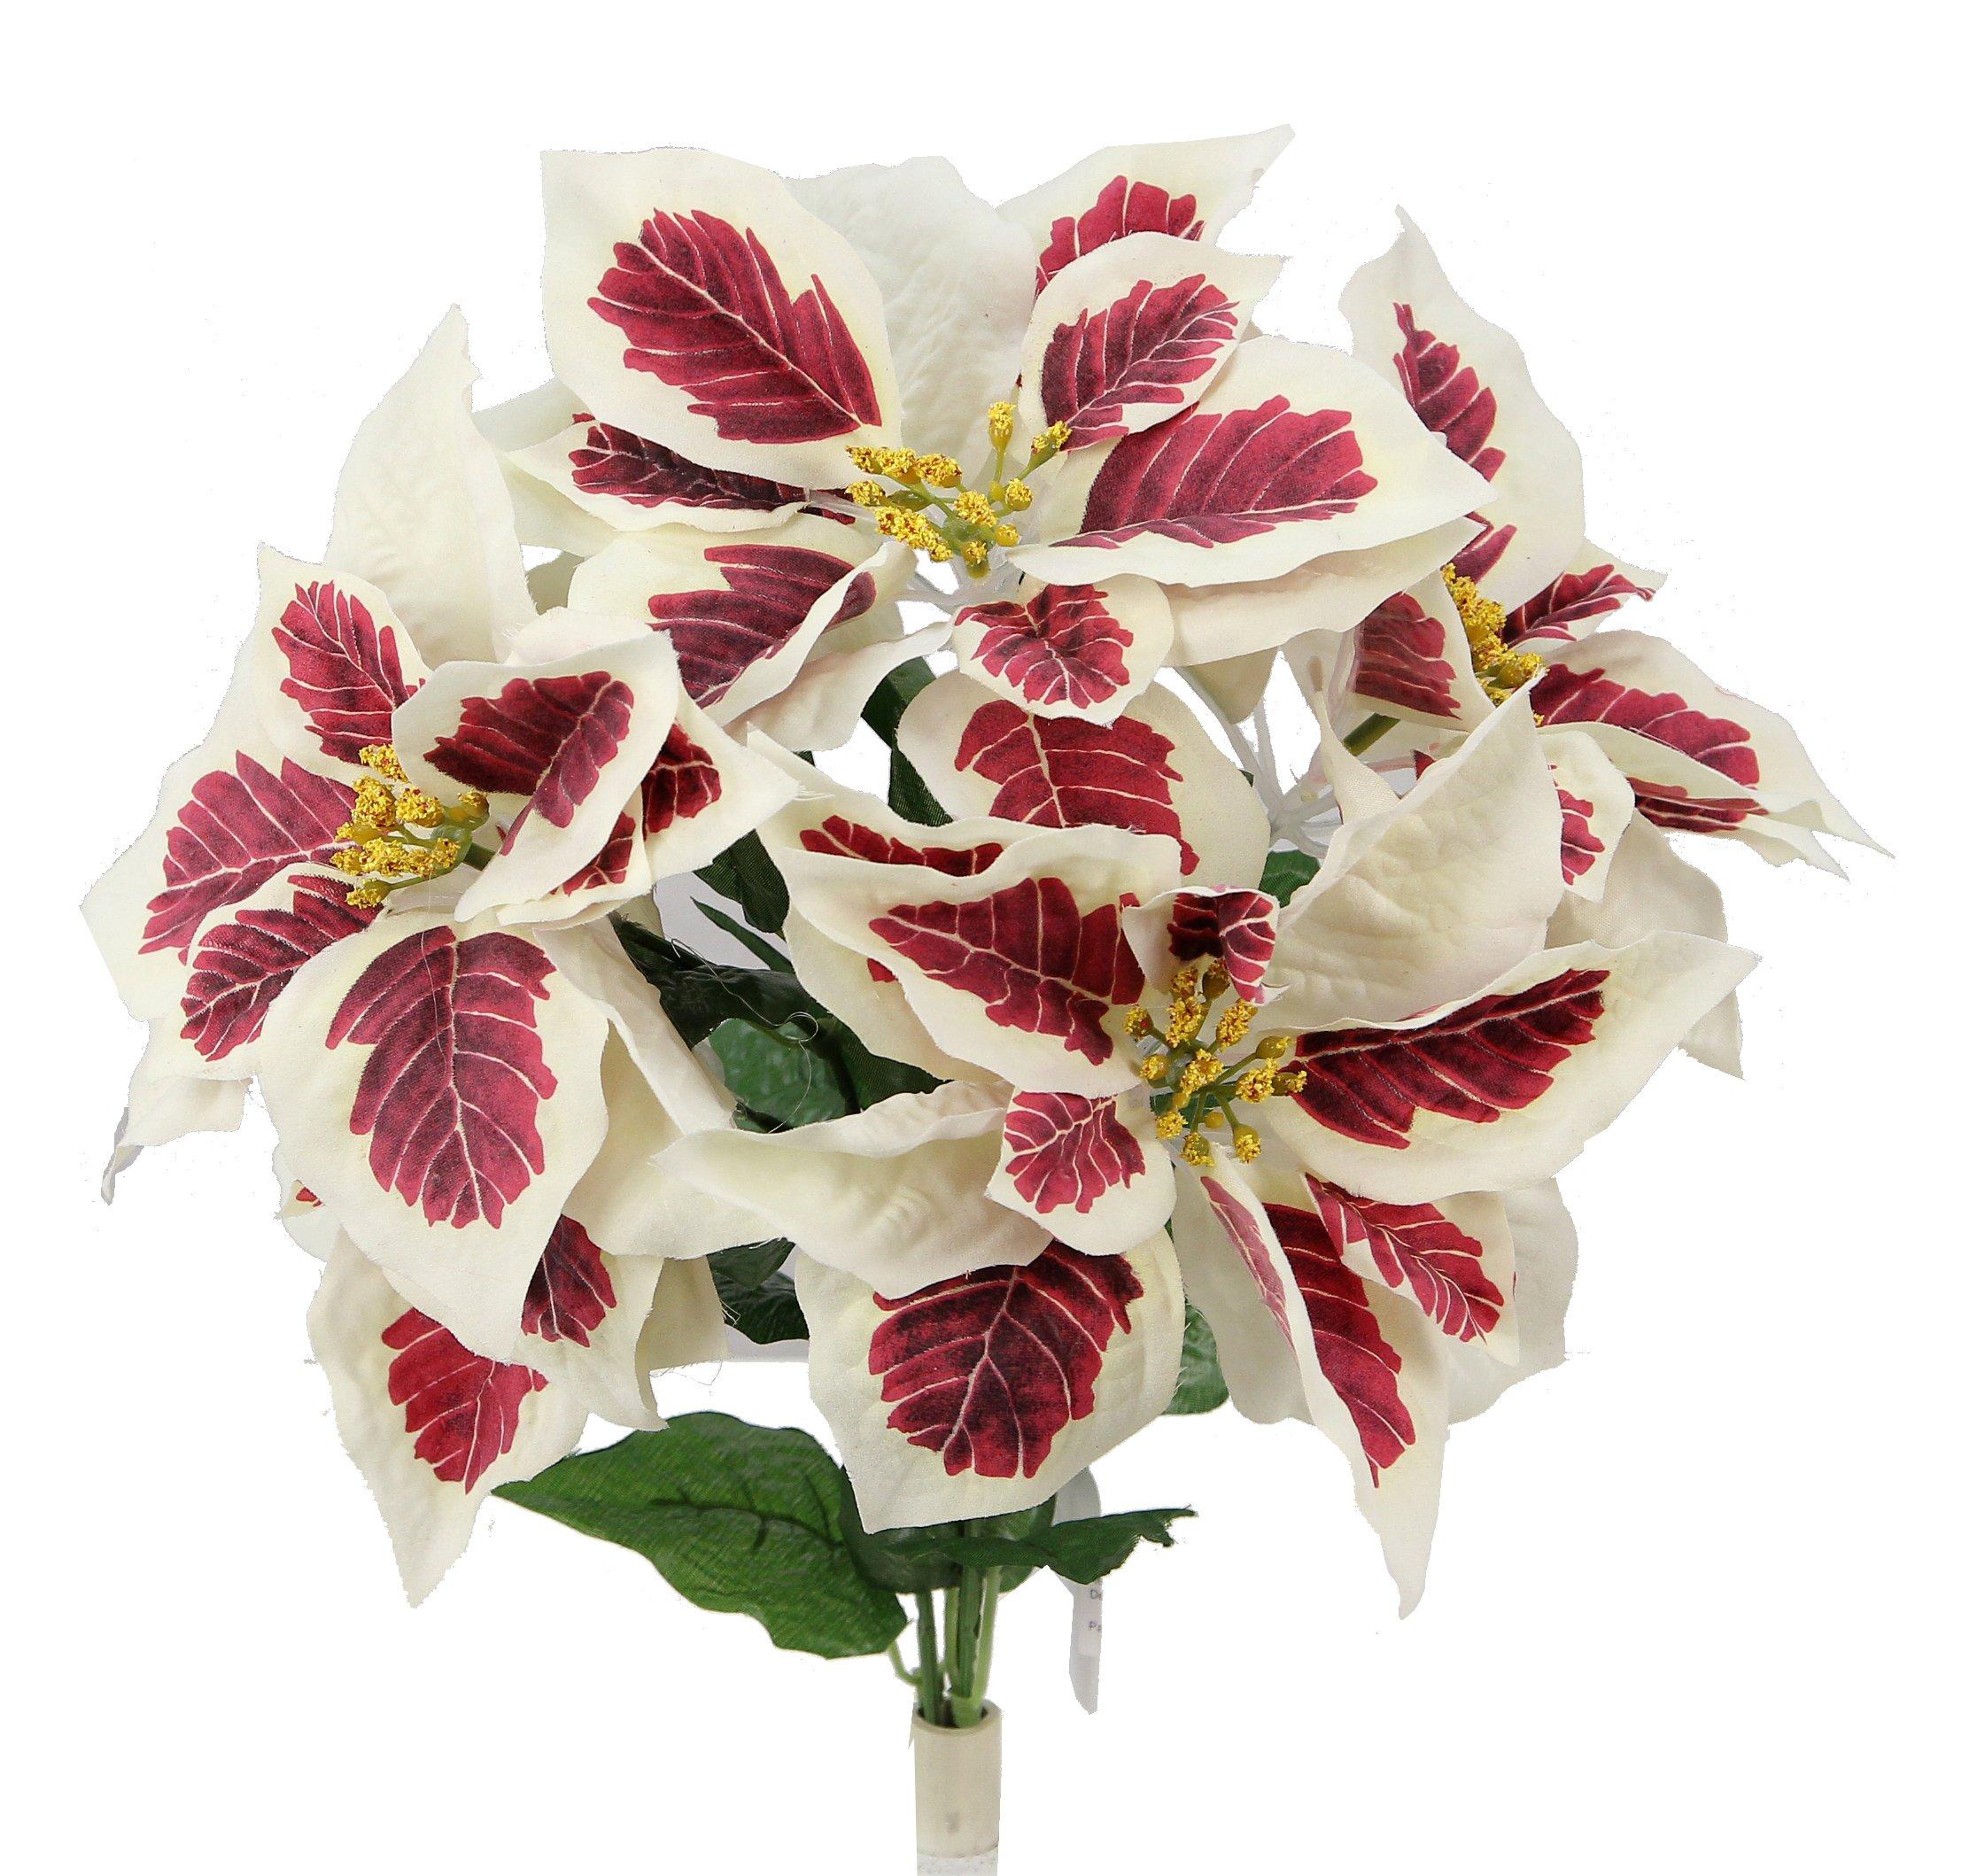 silk flower arrangements admired by nature gpb6858-peppermint artificial flower bush, peppermint poinsettias